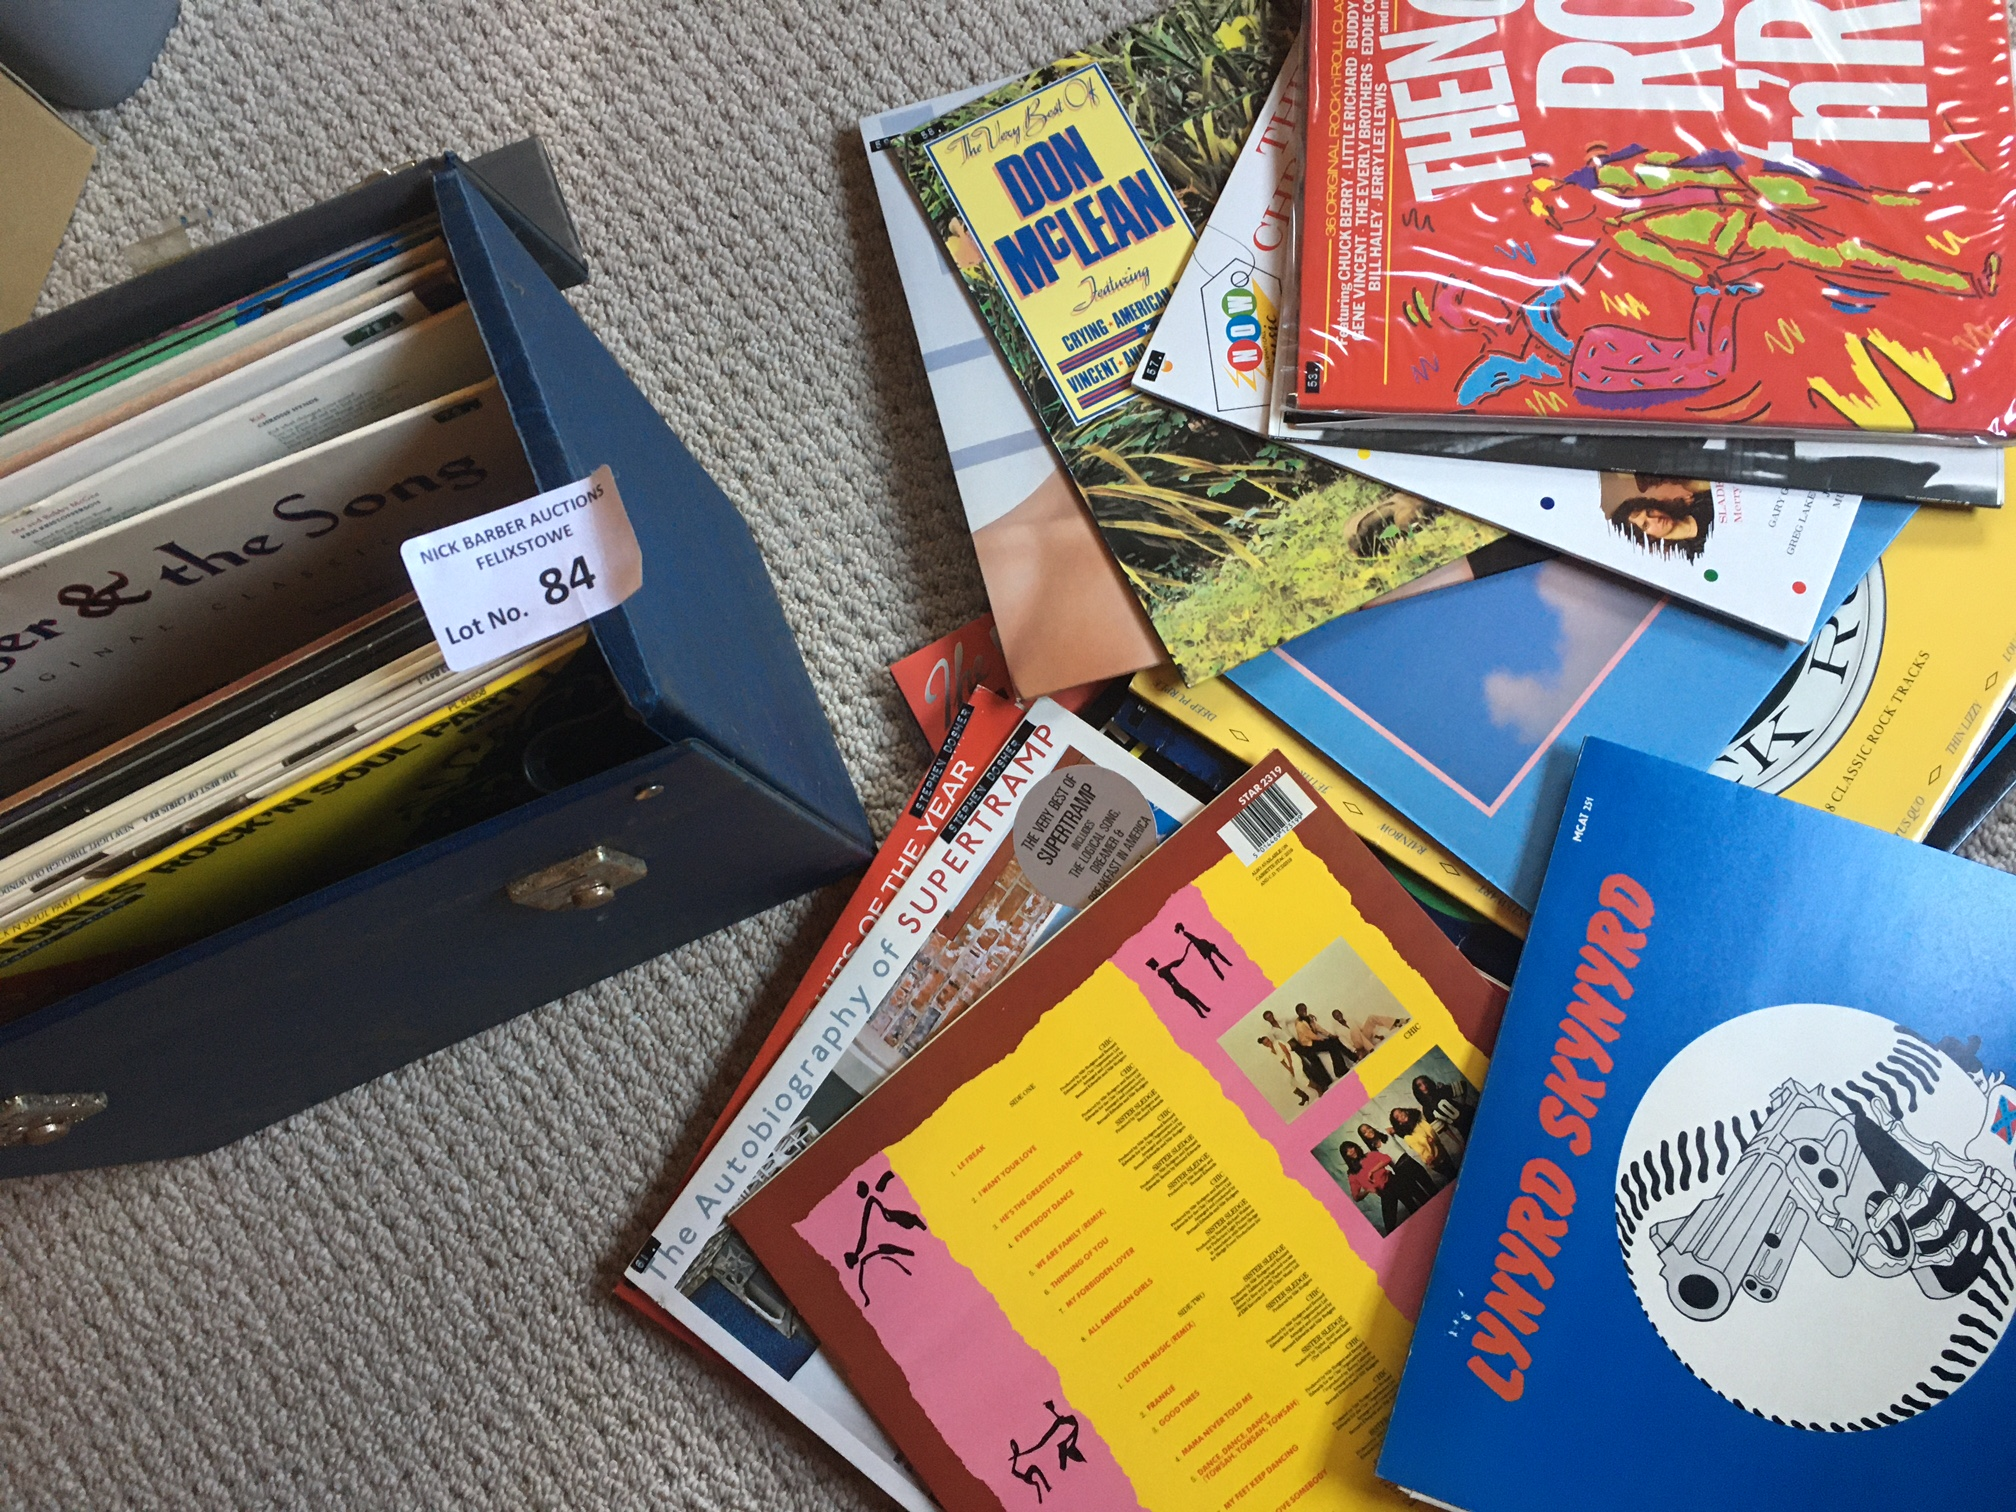 Records : Case of albums Classic Rock inc OMD, Dir